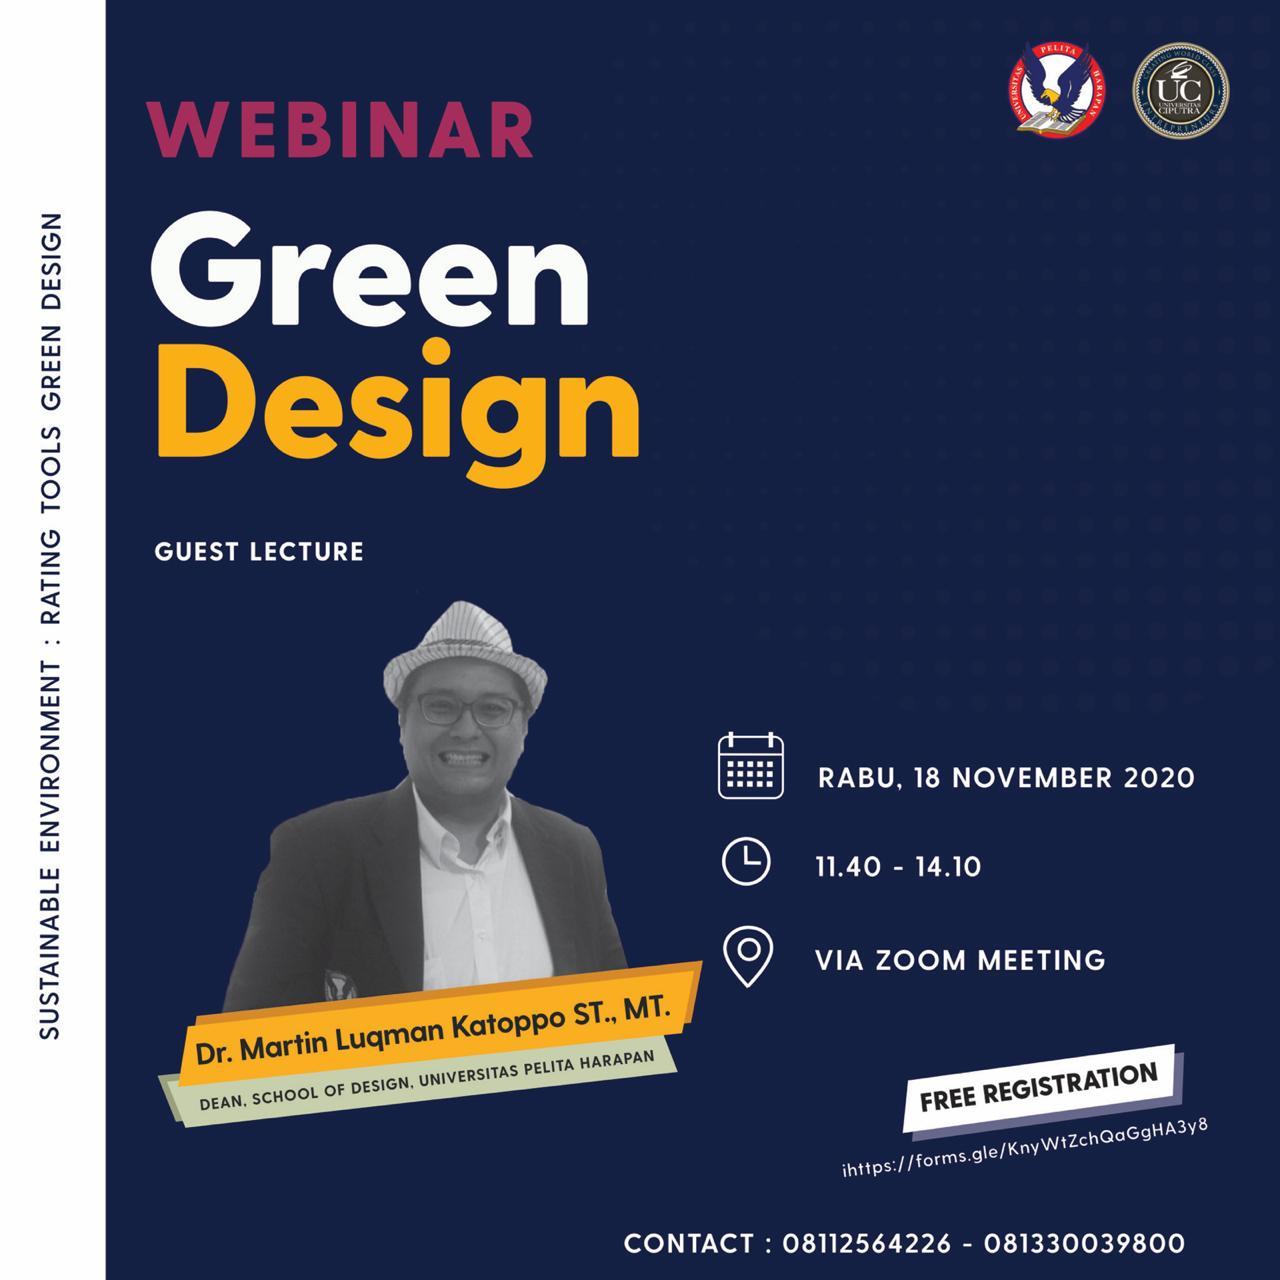 Webinar Green Design